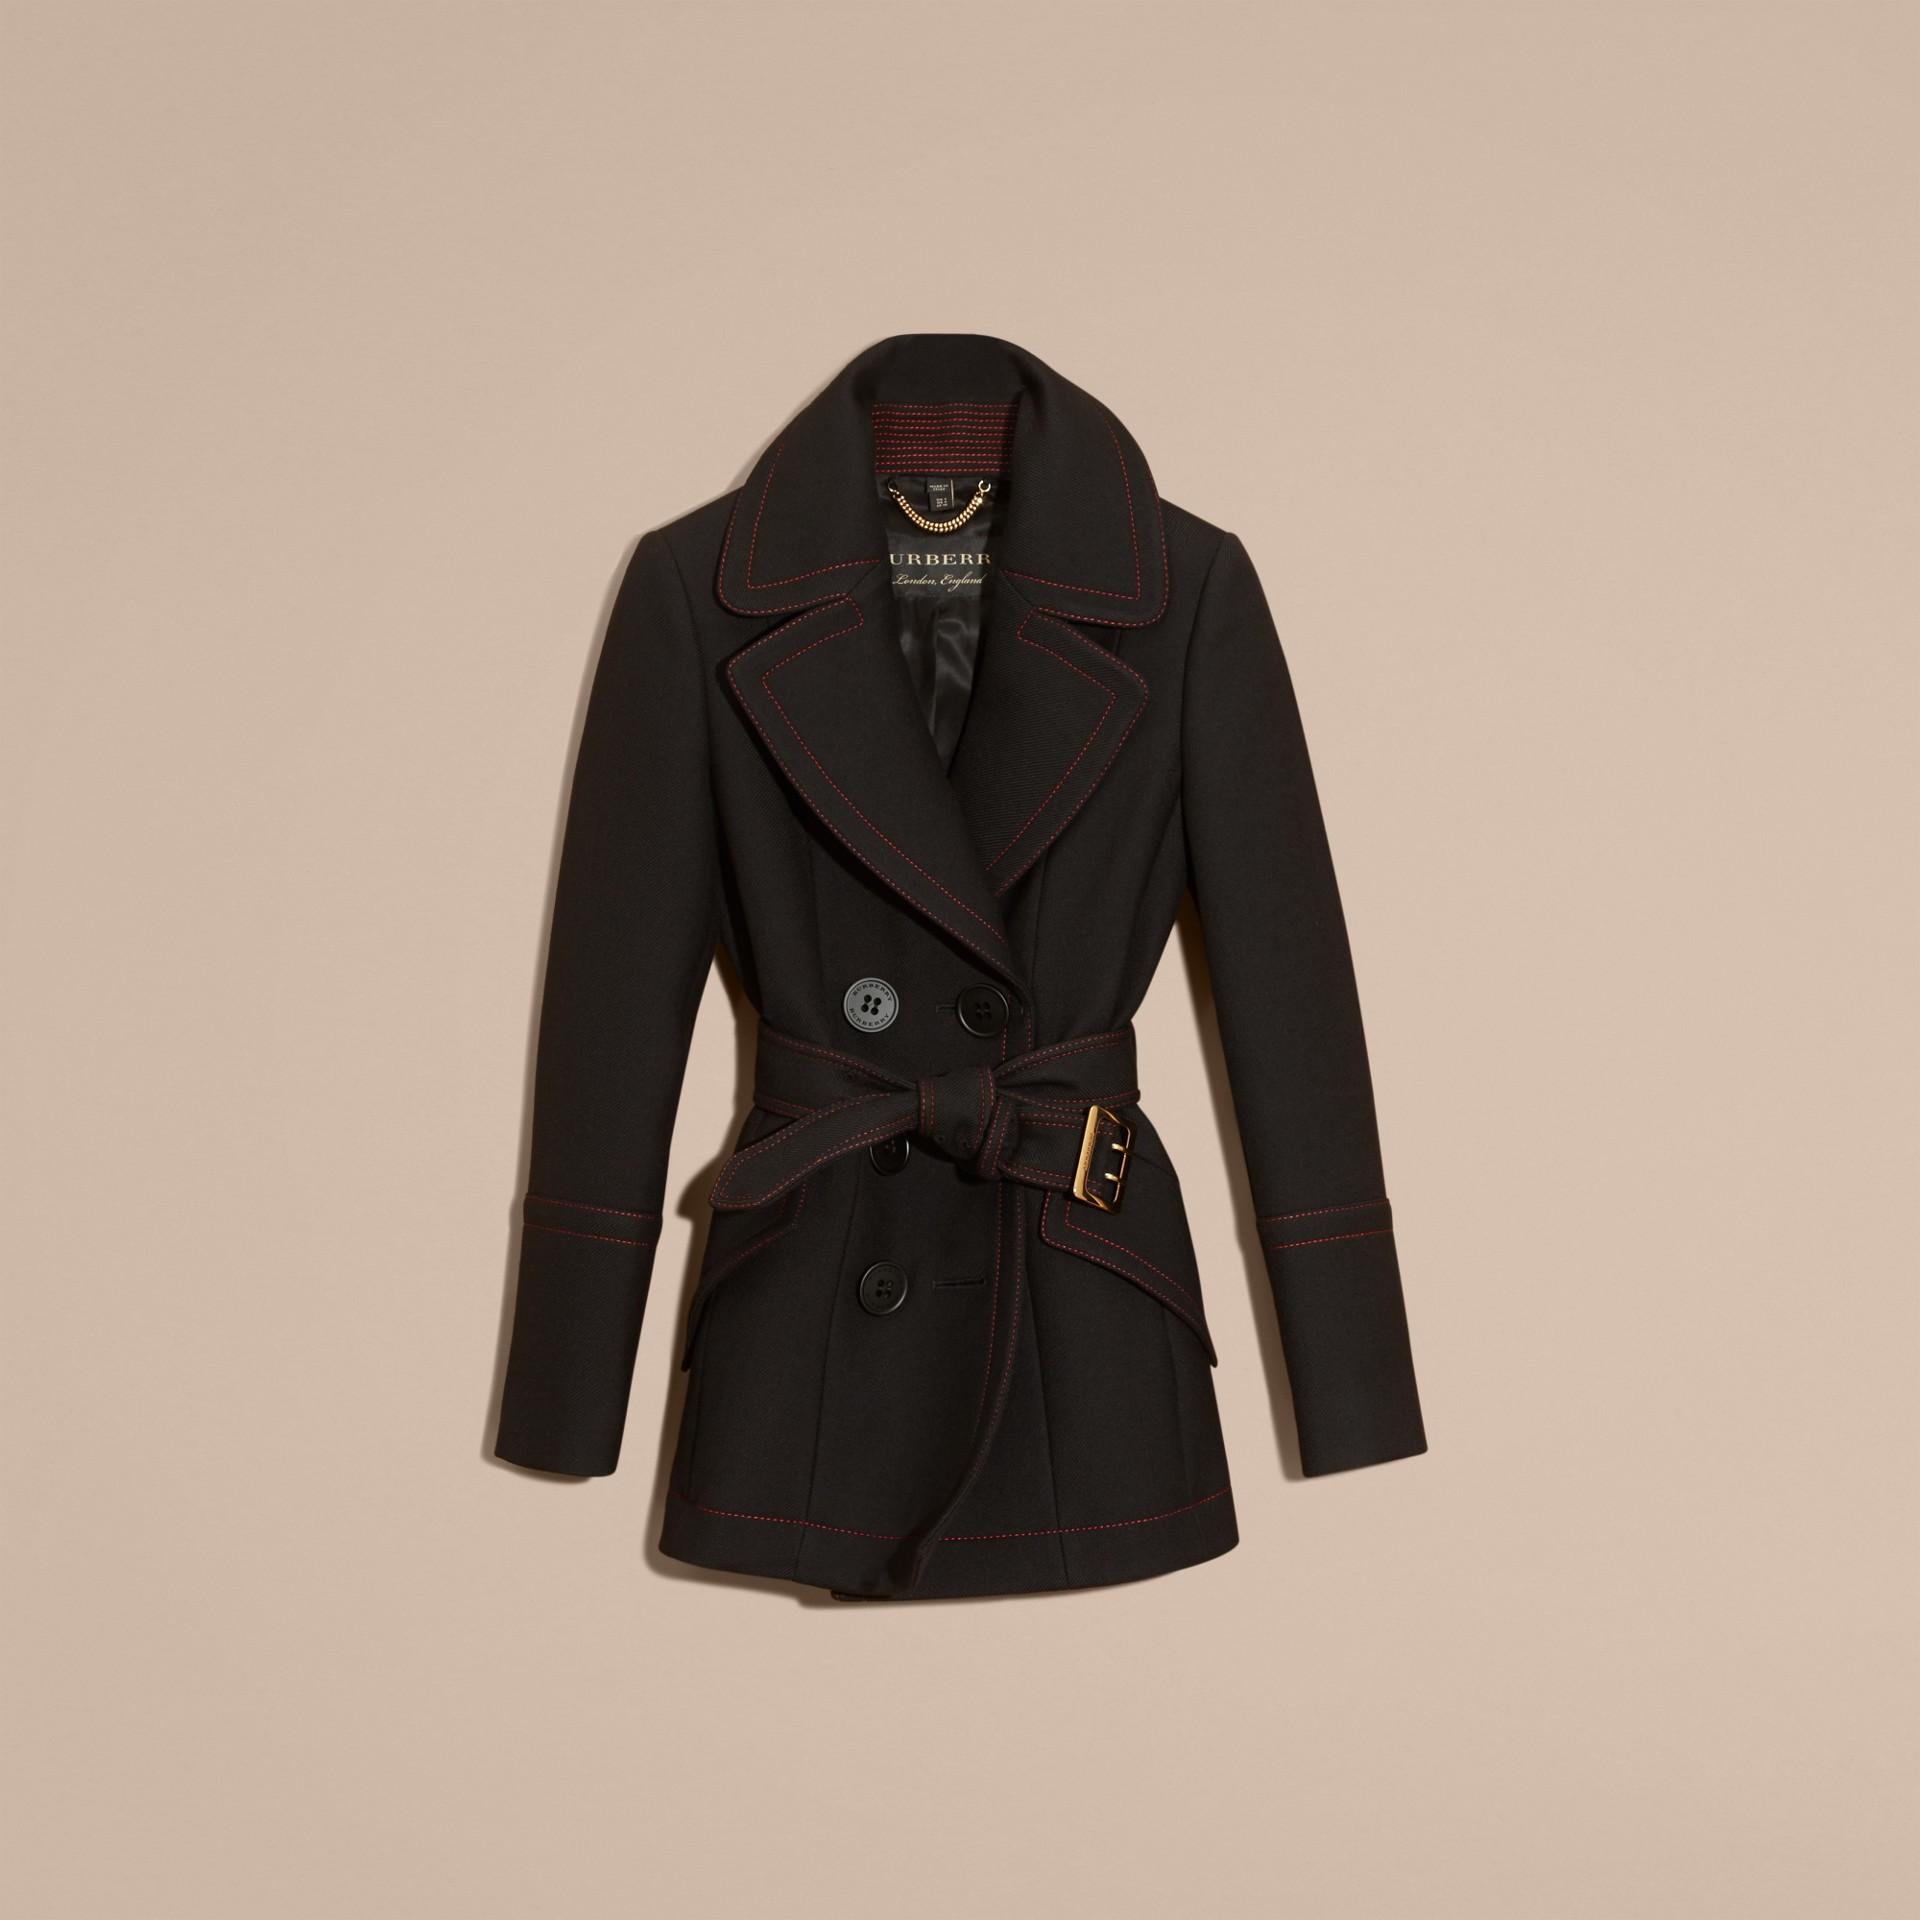 Black Wool Silk Pea Coat with Regimental Topstitching - gallery image 4